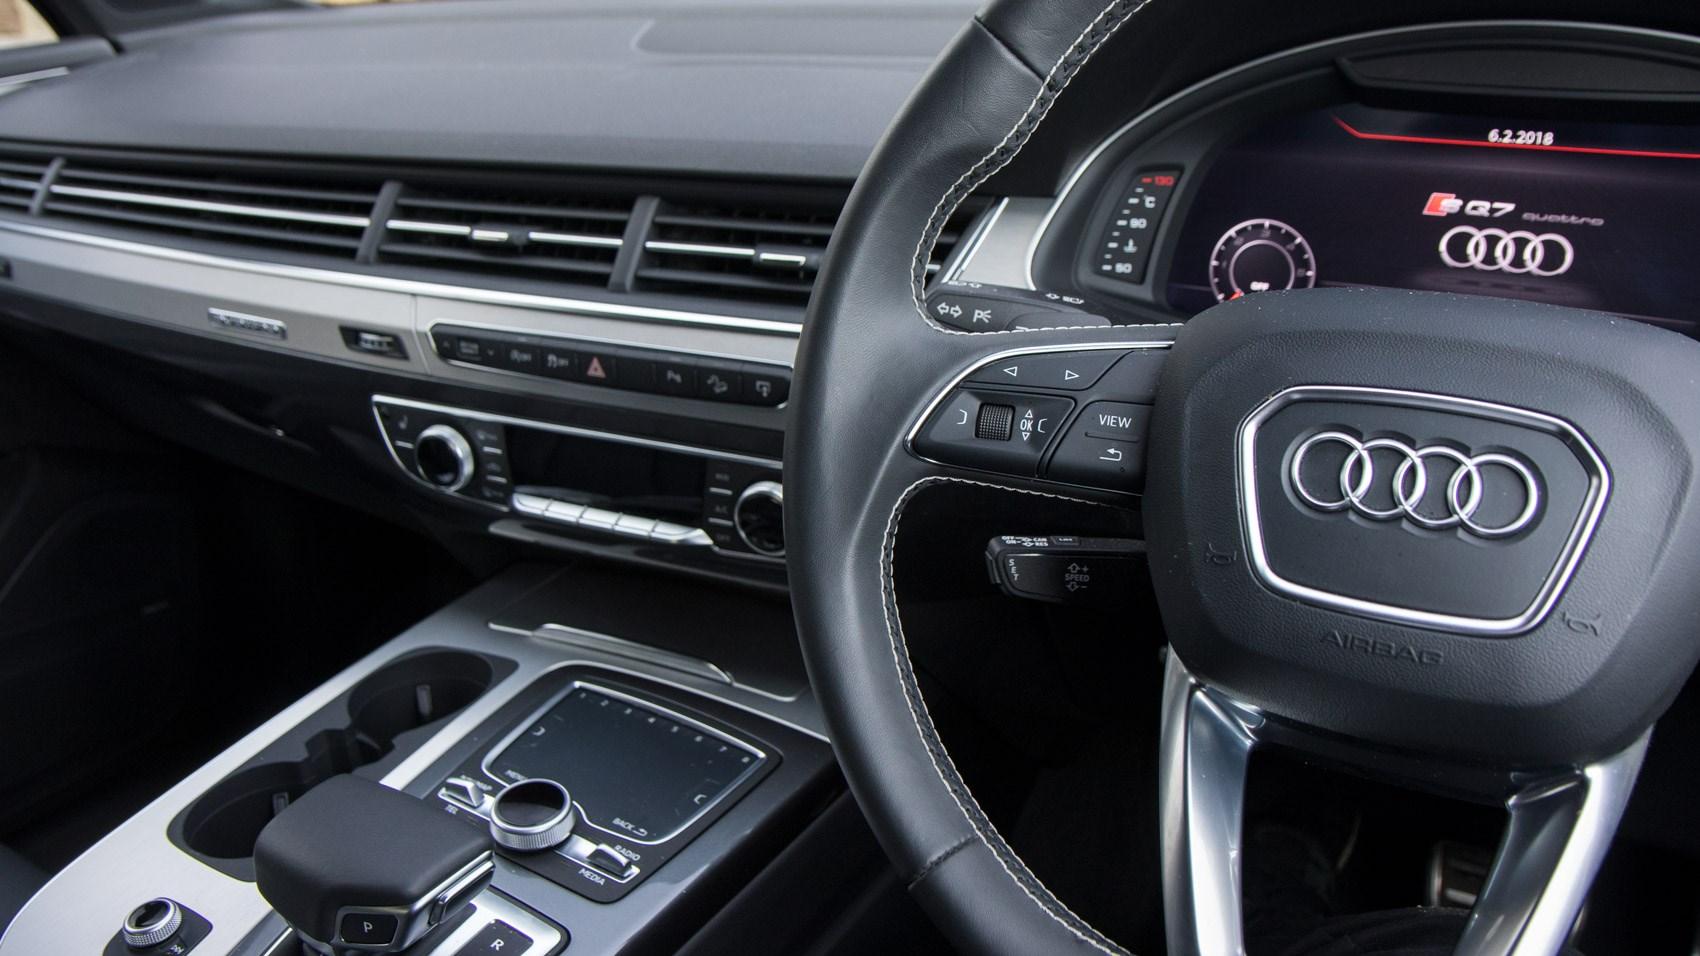 Audi audi sq7 tdi : New Audi SQ7 review: physics-bending fun with cutting edge-tech by ...